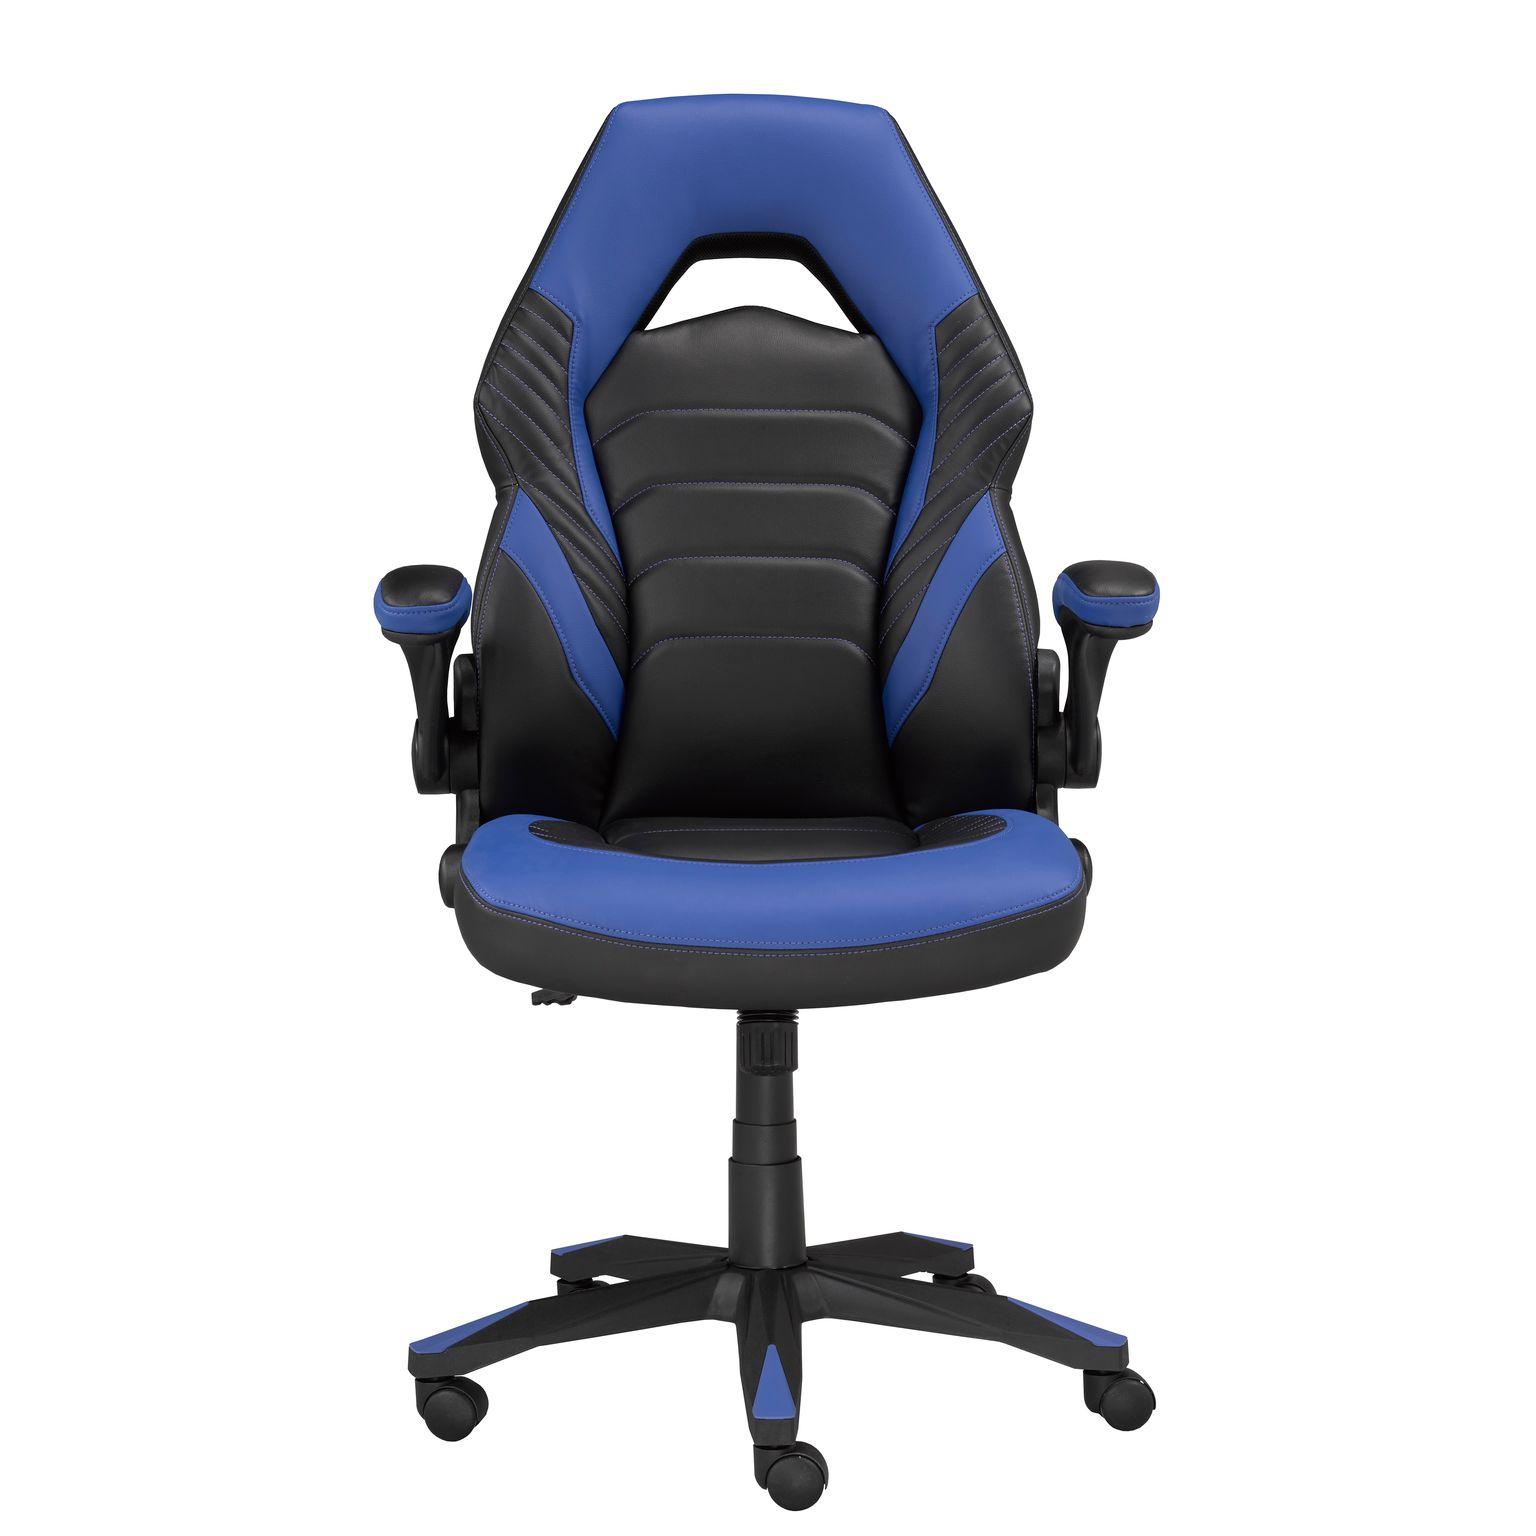 MIA OFFICE CHAIR - BLACK/BLUE